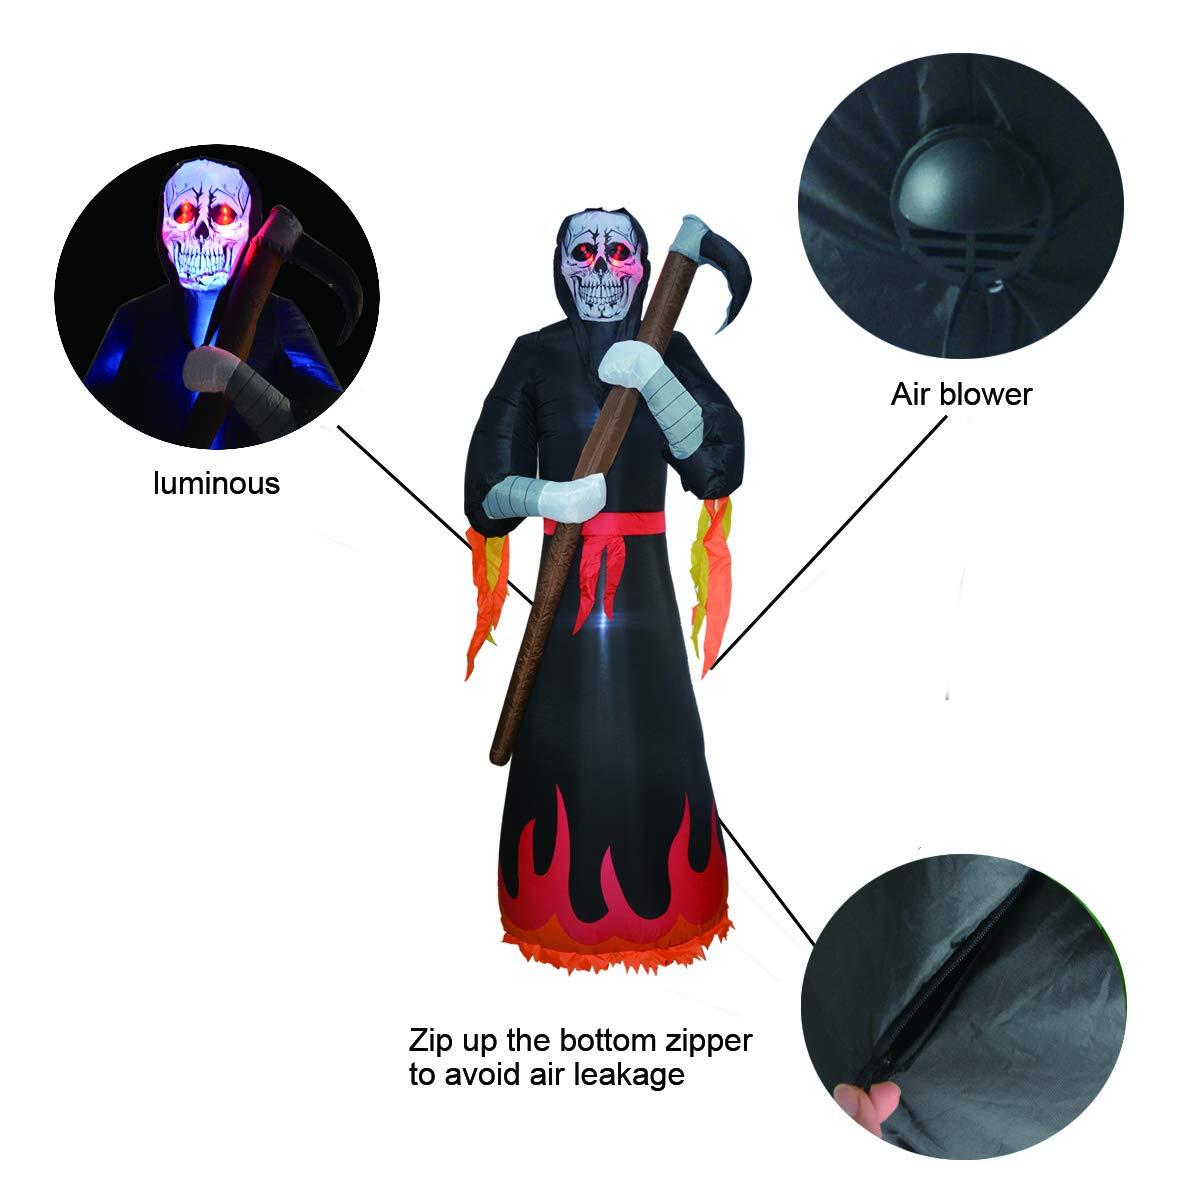 GOOSH 8 Foot Tall Halloween Inflatables Grim Reaper Inflatable Blow Up Outdoor Halloween Decorations